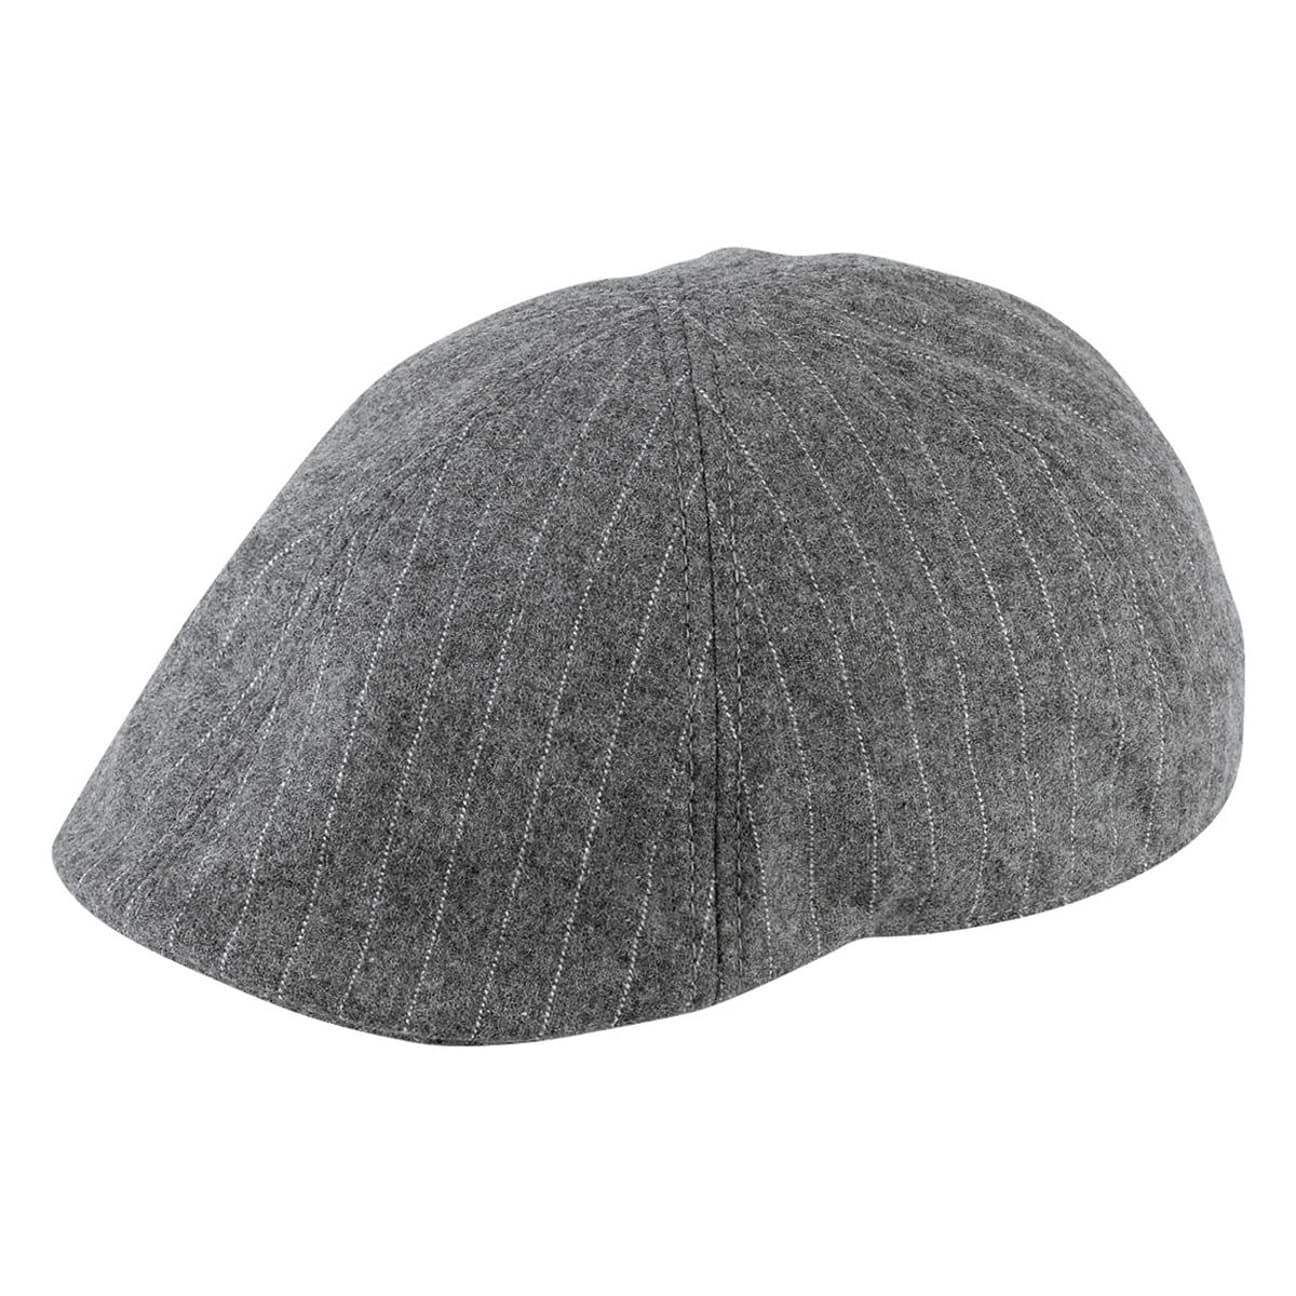 Gorra Gatsby Sport Classic - Gorras - sombreroshop.es 504d2ae7468